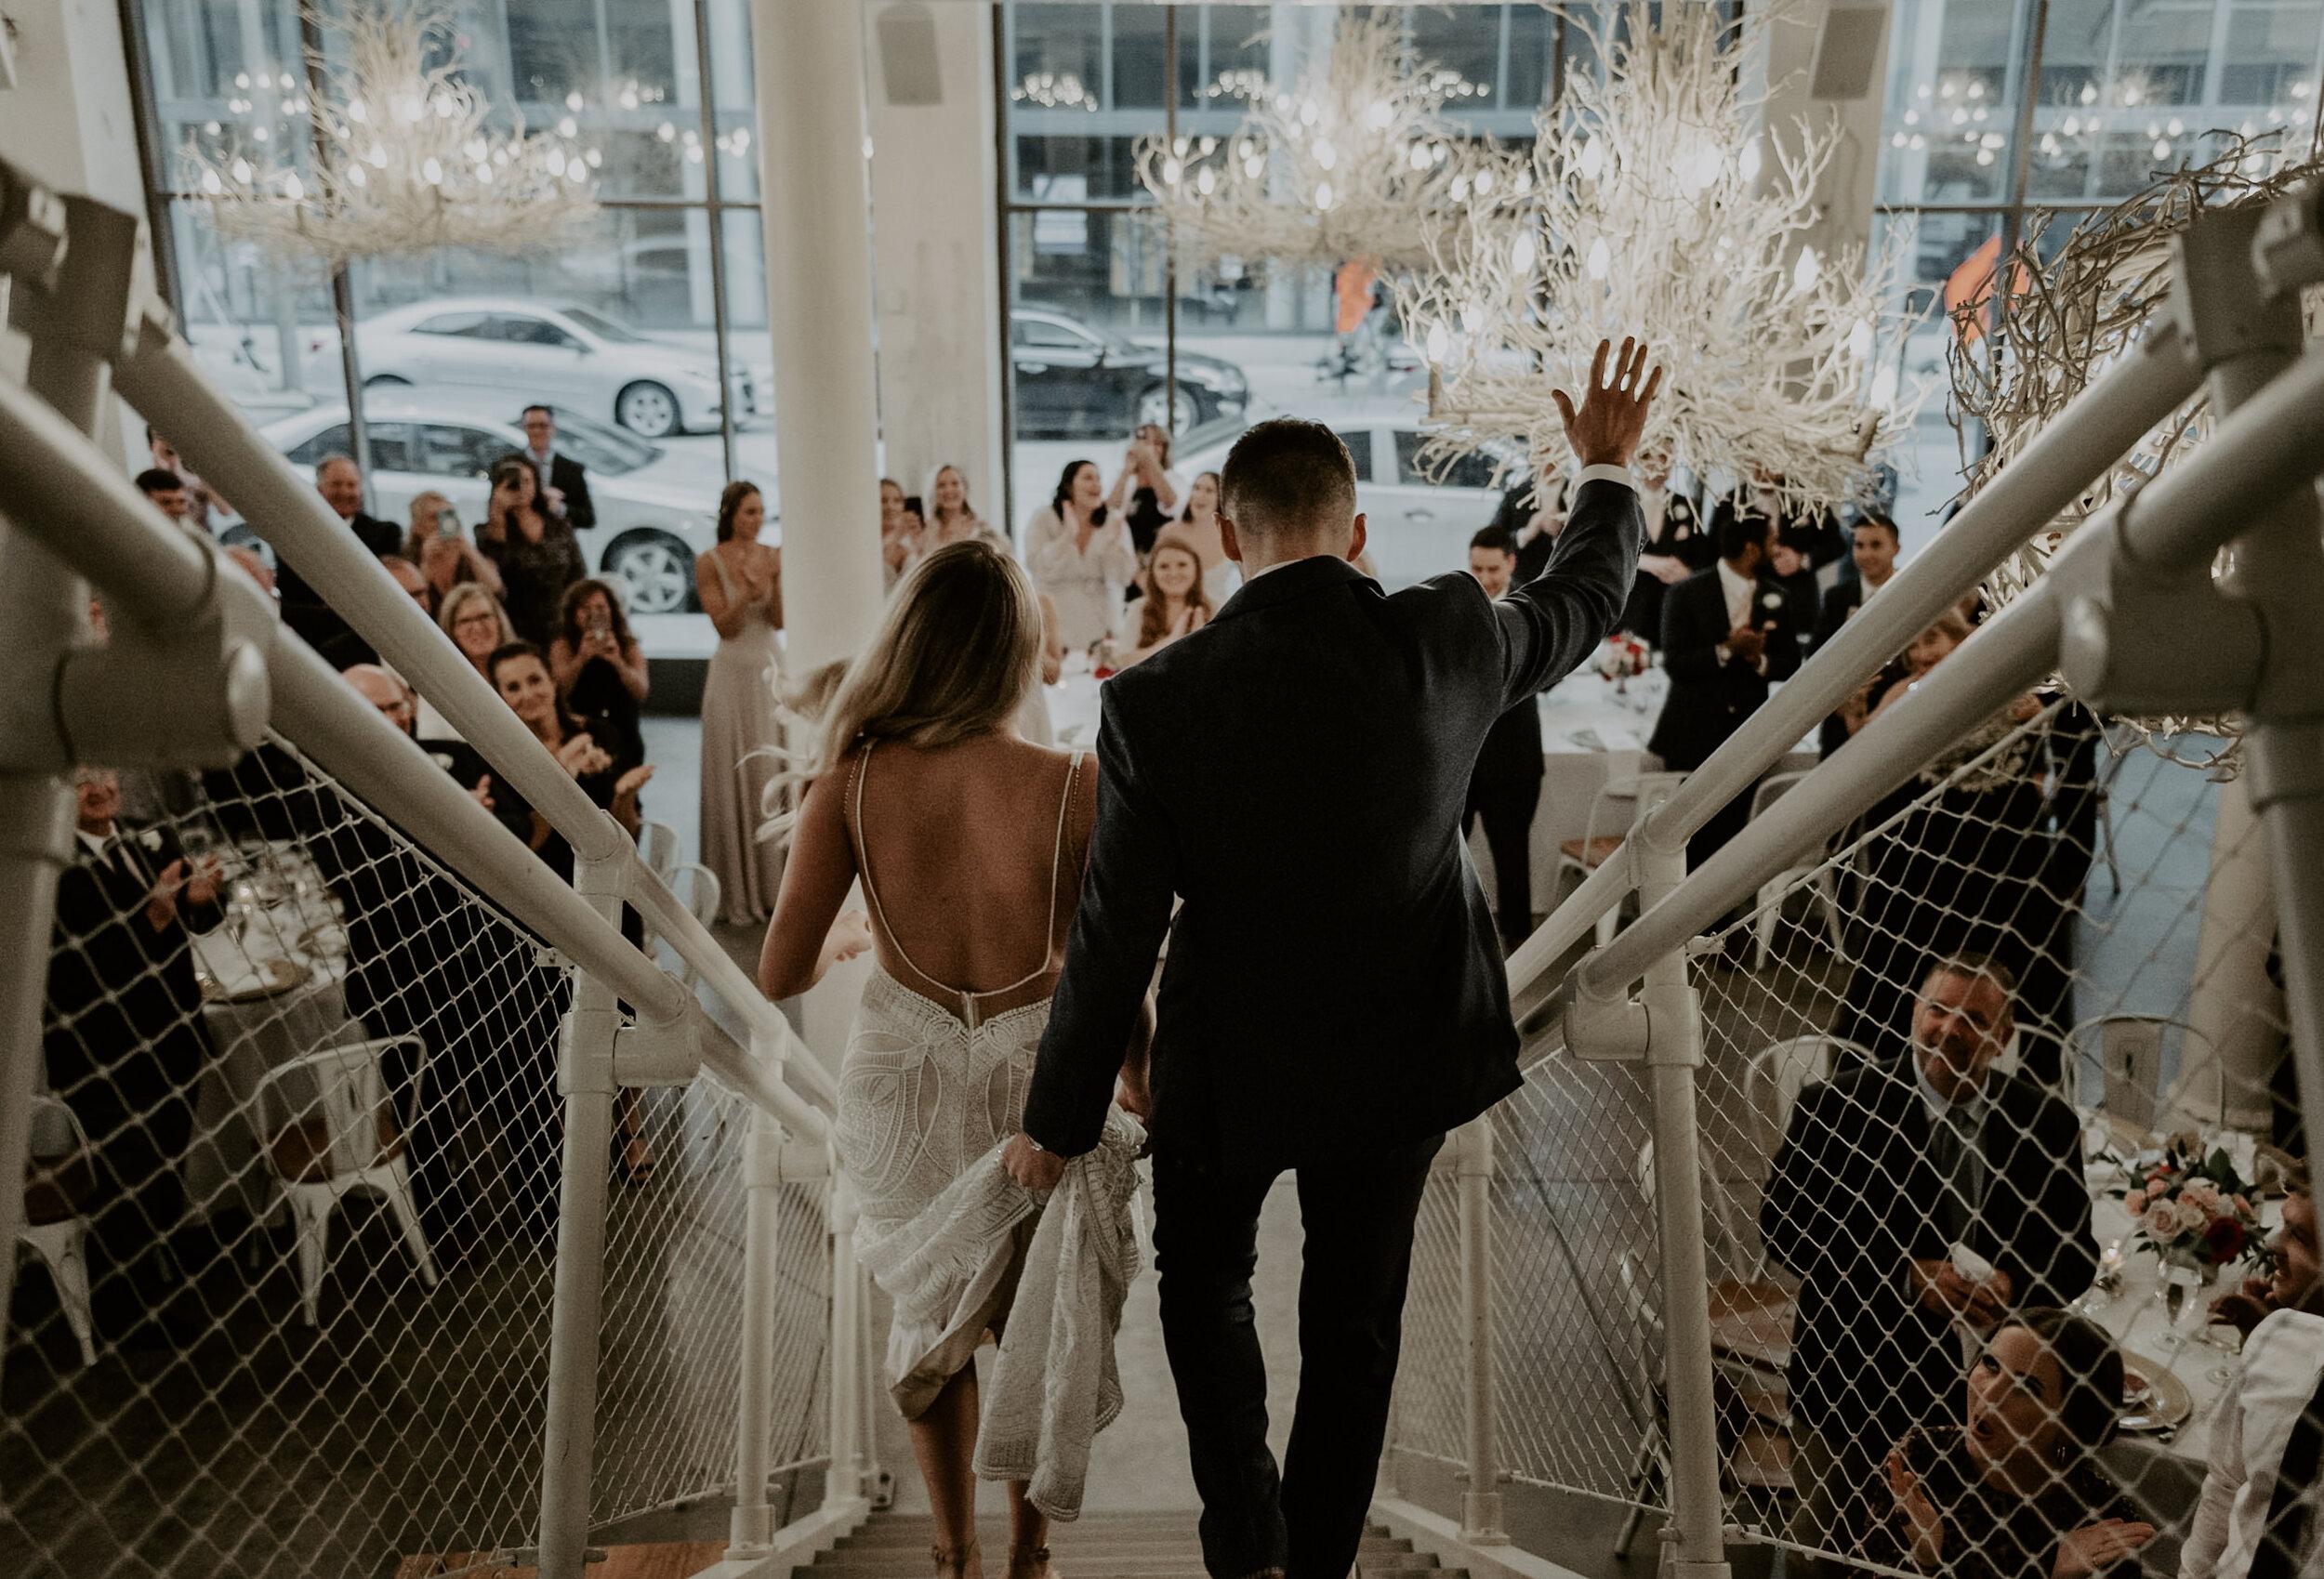 st-louis-wedding-photographer-ov-photography-willow